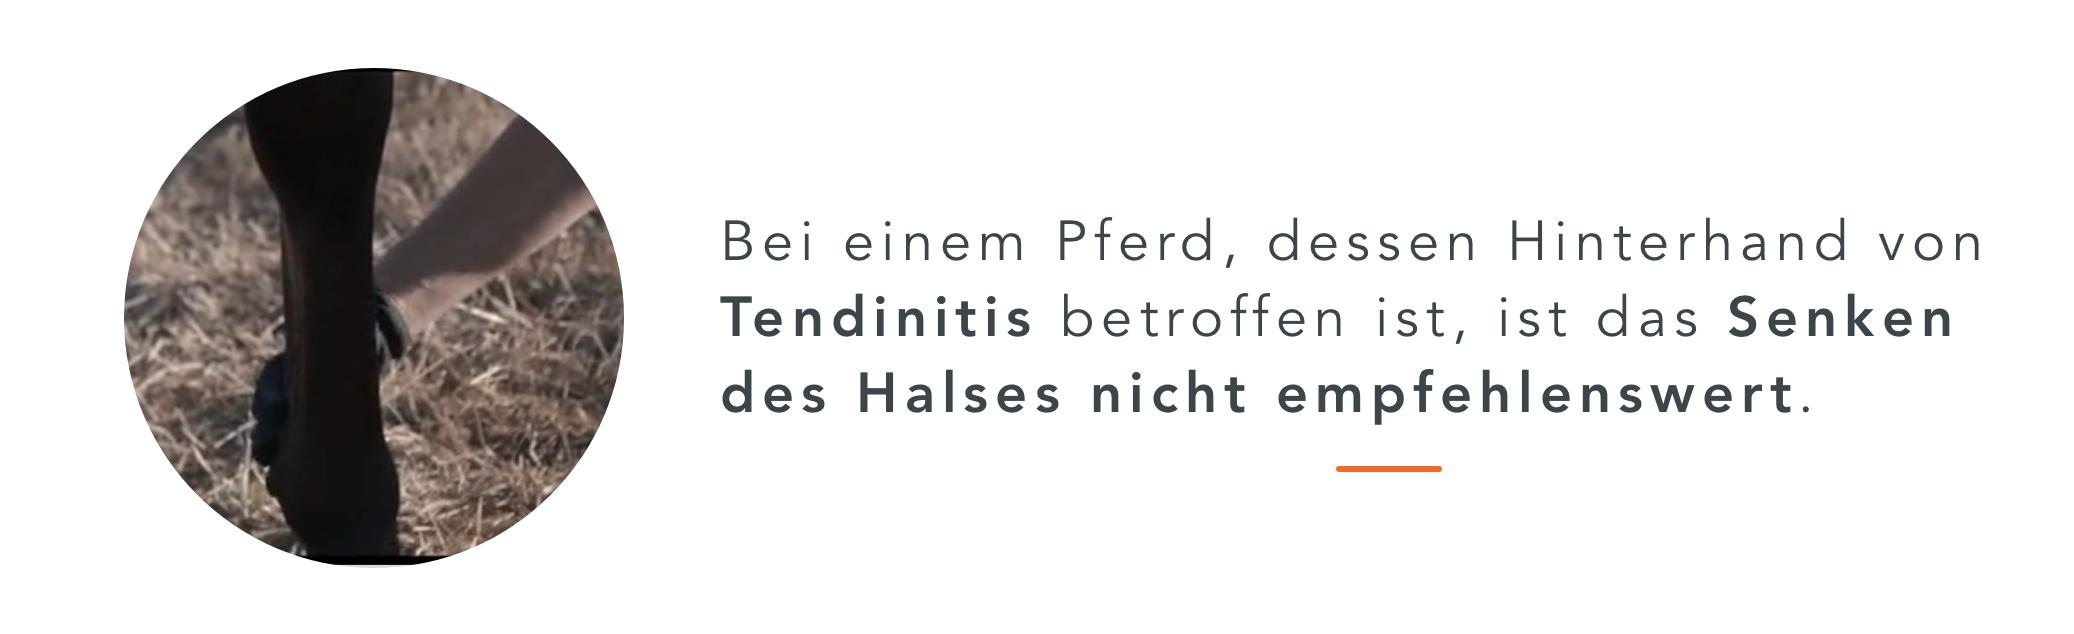 Halsmuskulatur_Tipps_DE